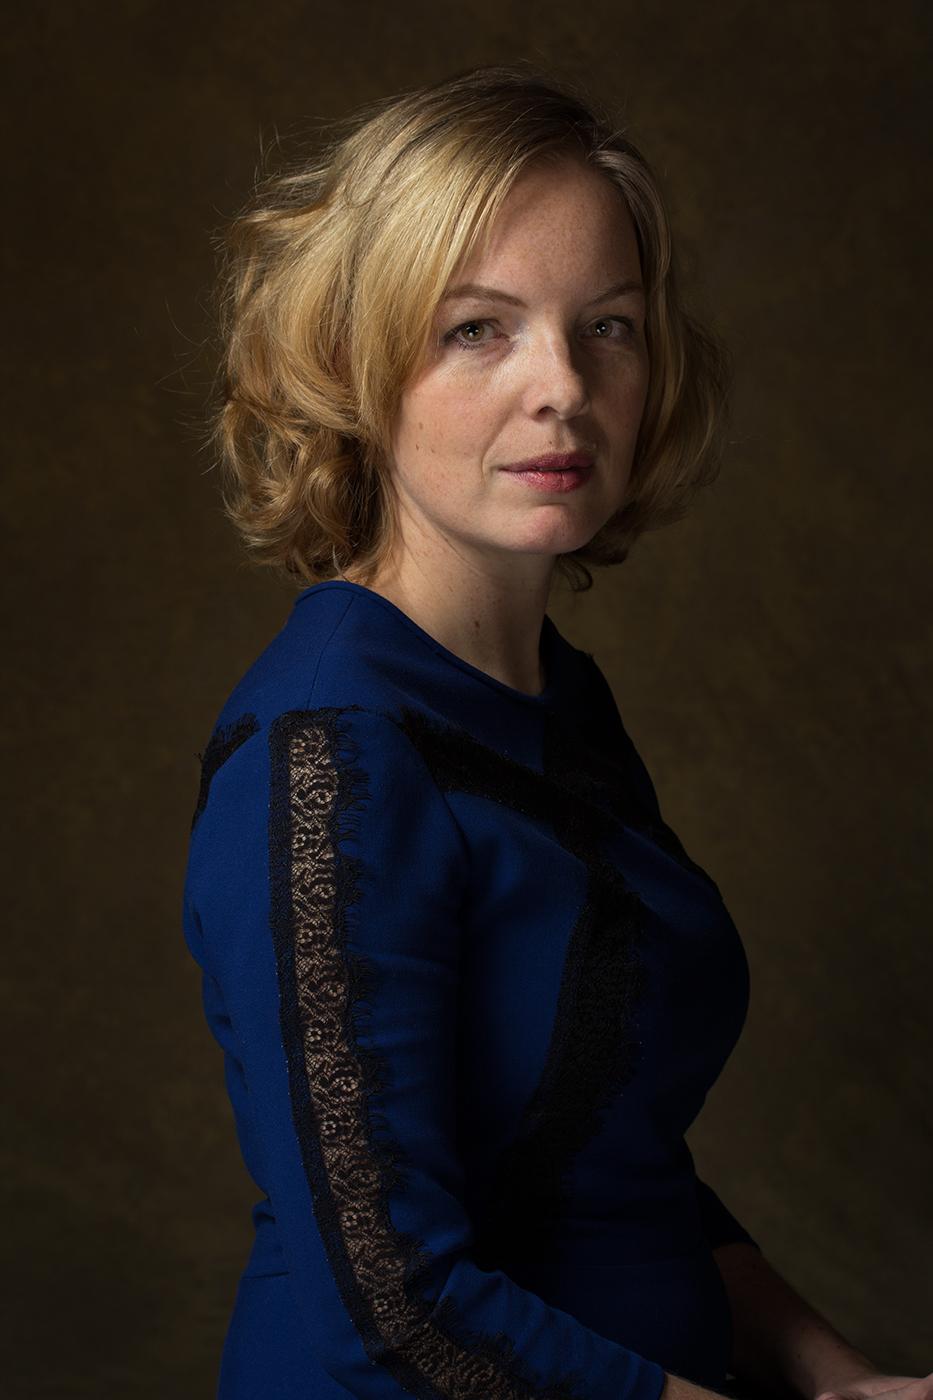 Susanne Middelberg, portrait, Fine Art